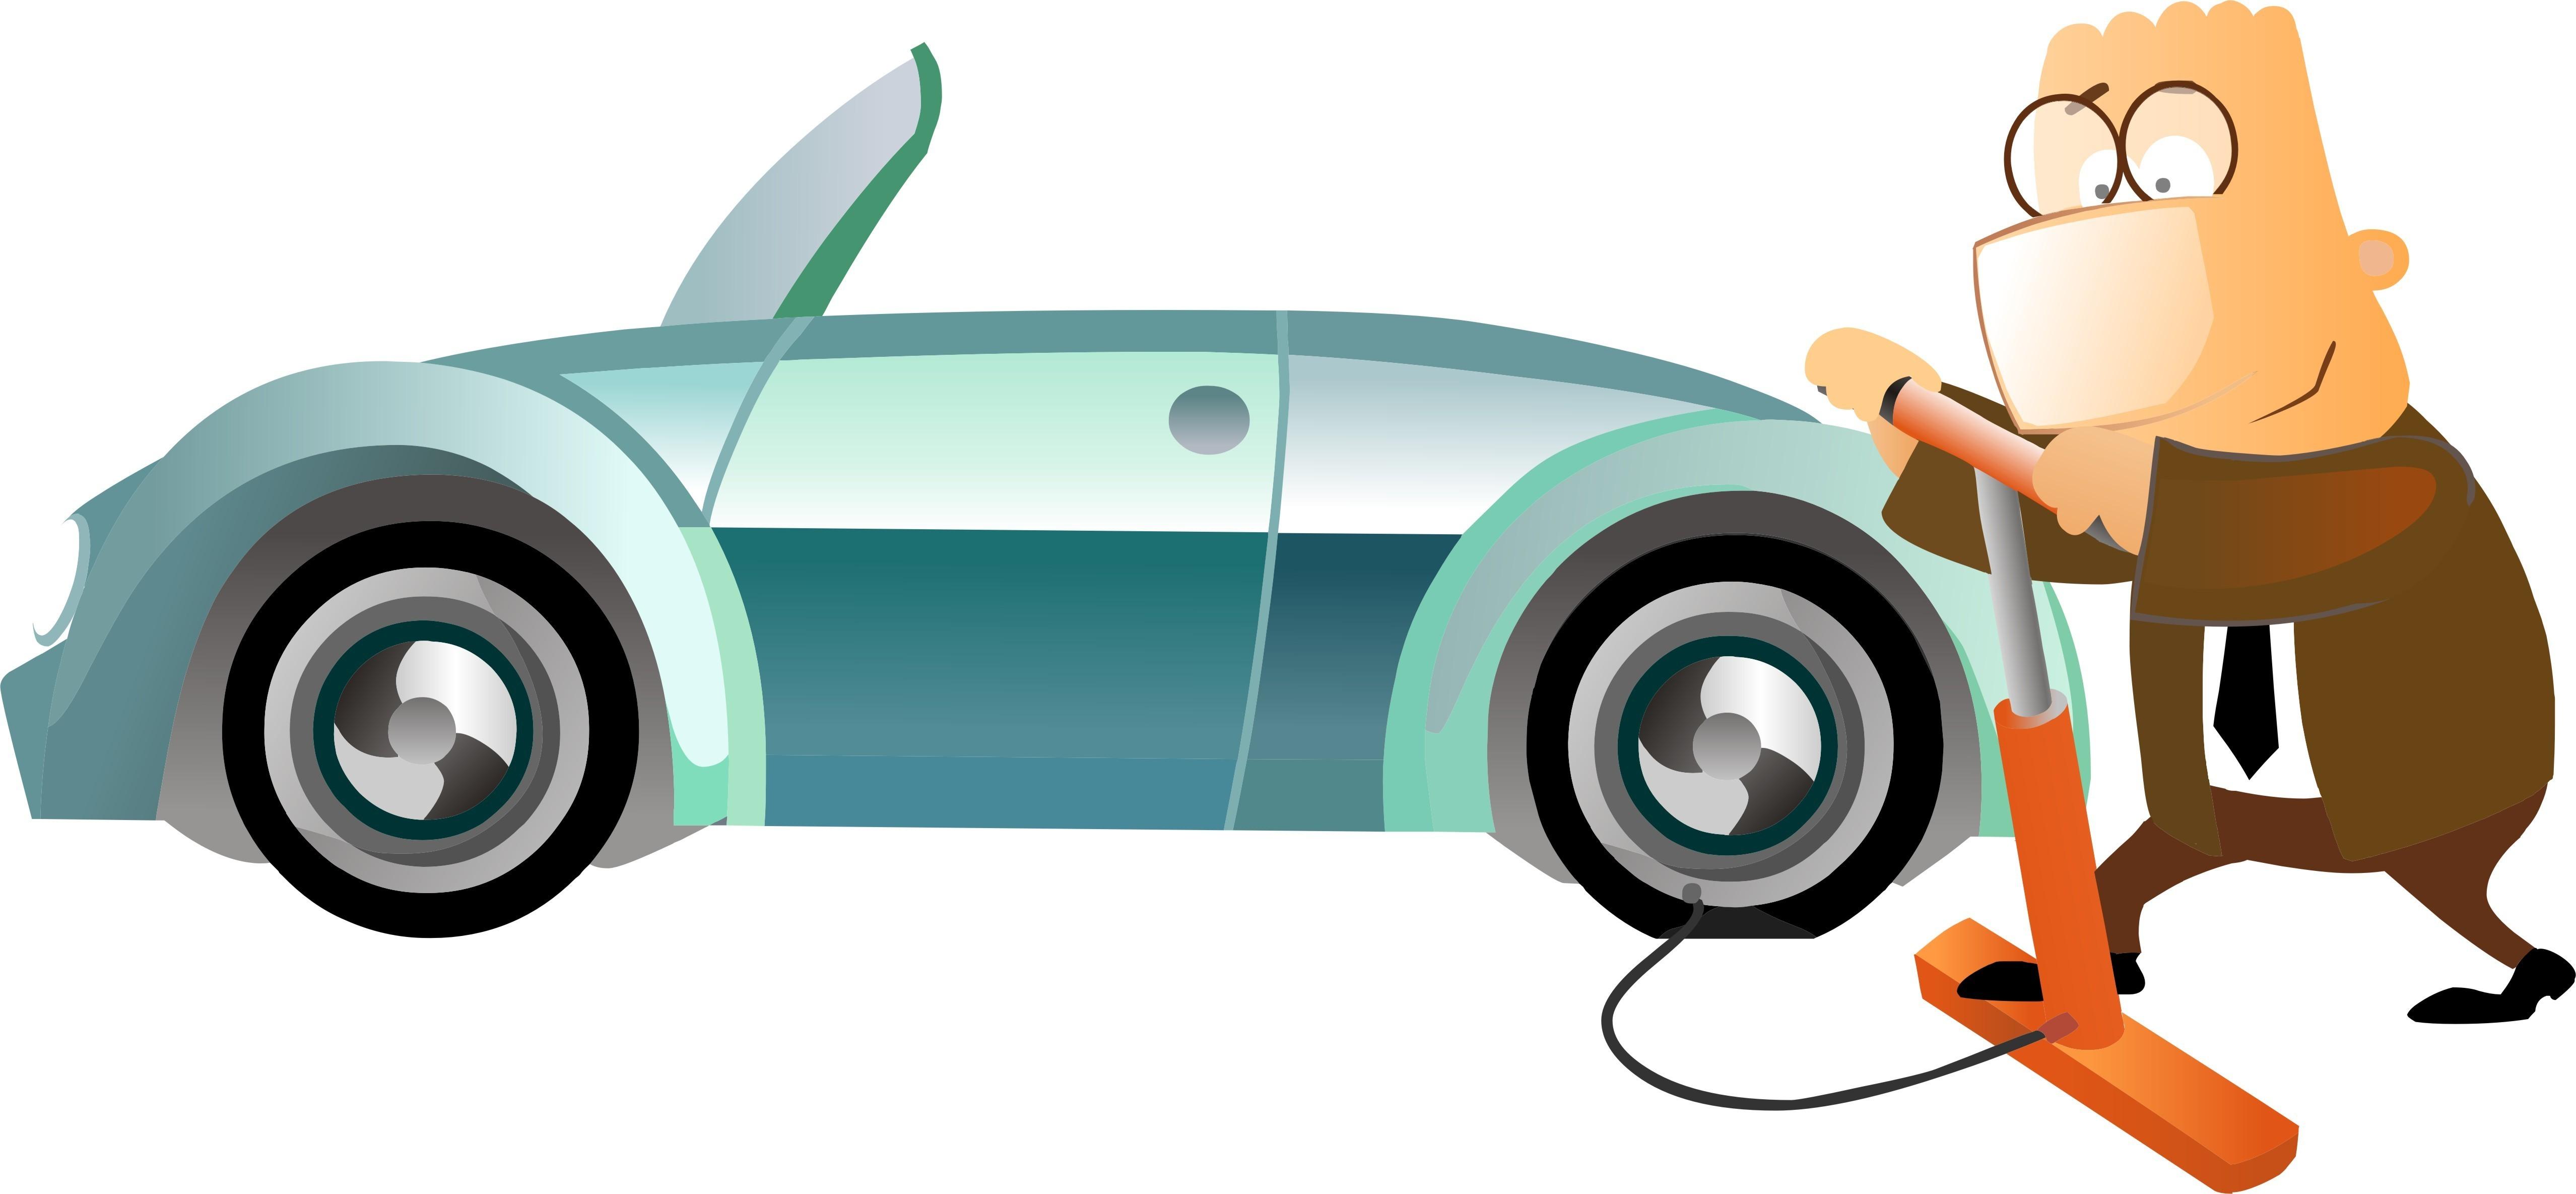 5113x2369 Tires Clipart Tire Repair